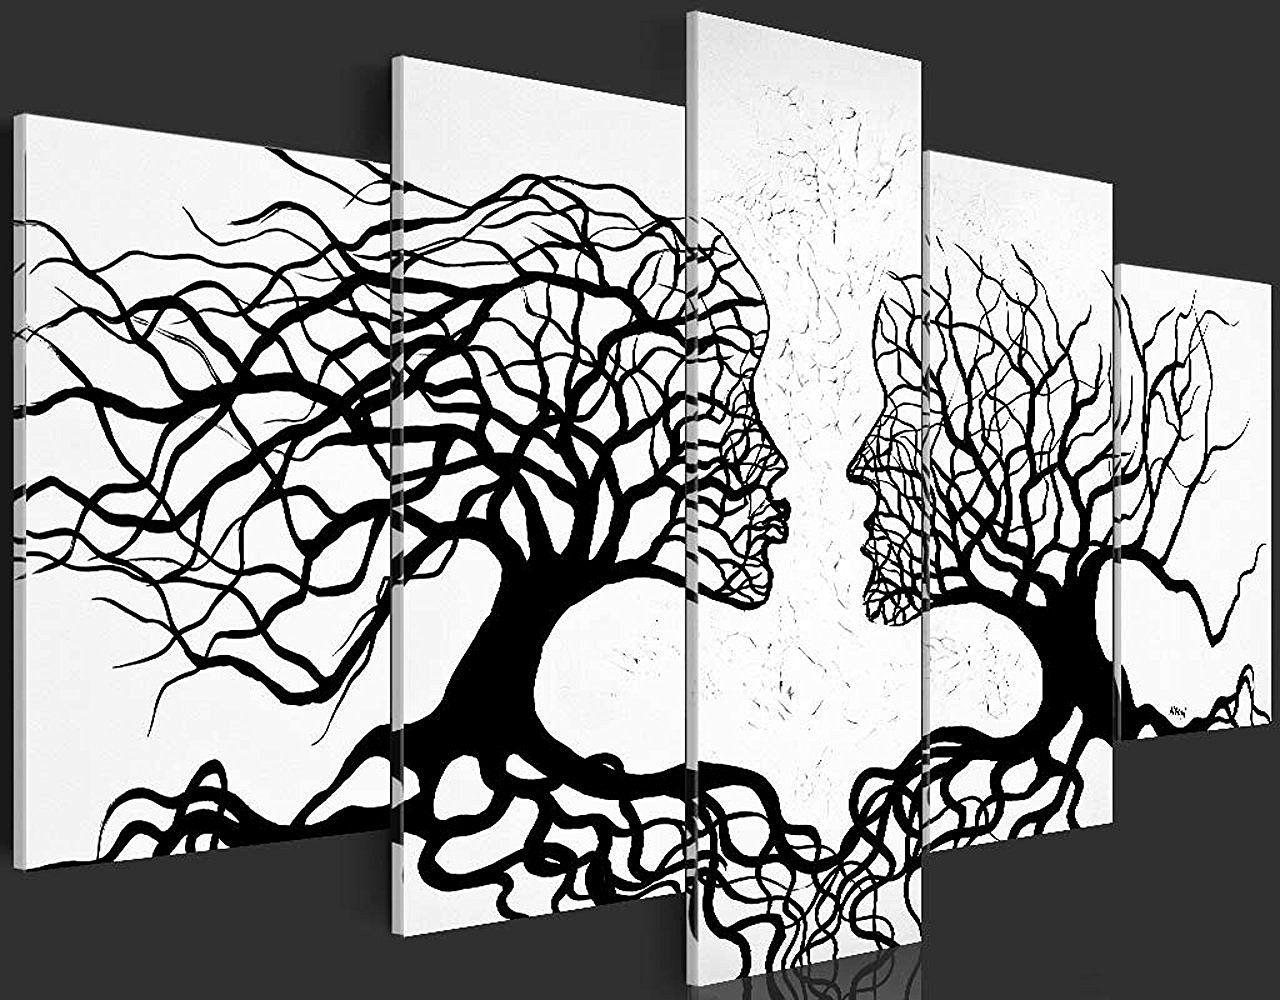 Bilder 200x100 Cm Xxl Format Fertig Aufgespannt Top Vlies Leinwand 5 Teilig Wand Bild Kunstdru Wandbild Abstrakt Leinwandbilder Abstrakt Abstrakt